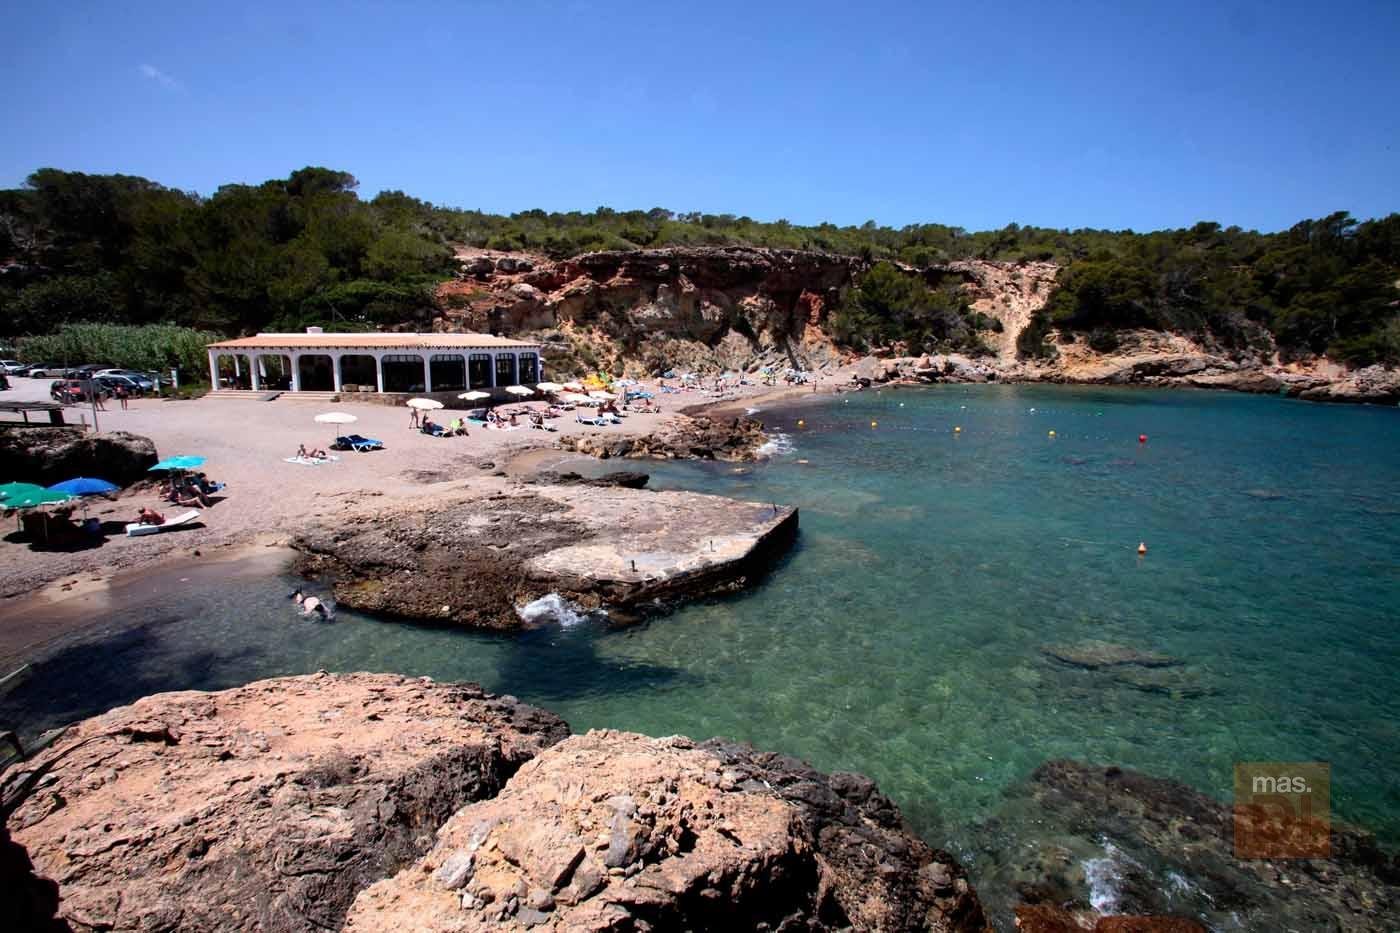 Restaurante Cala Xarraca. Sumergirse en la Ibiza tranquila en Cala Xarraca